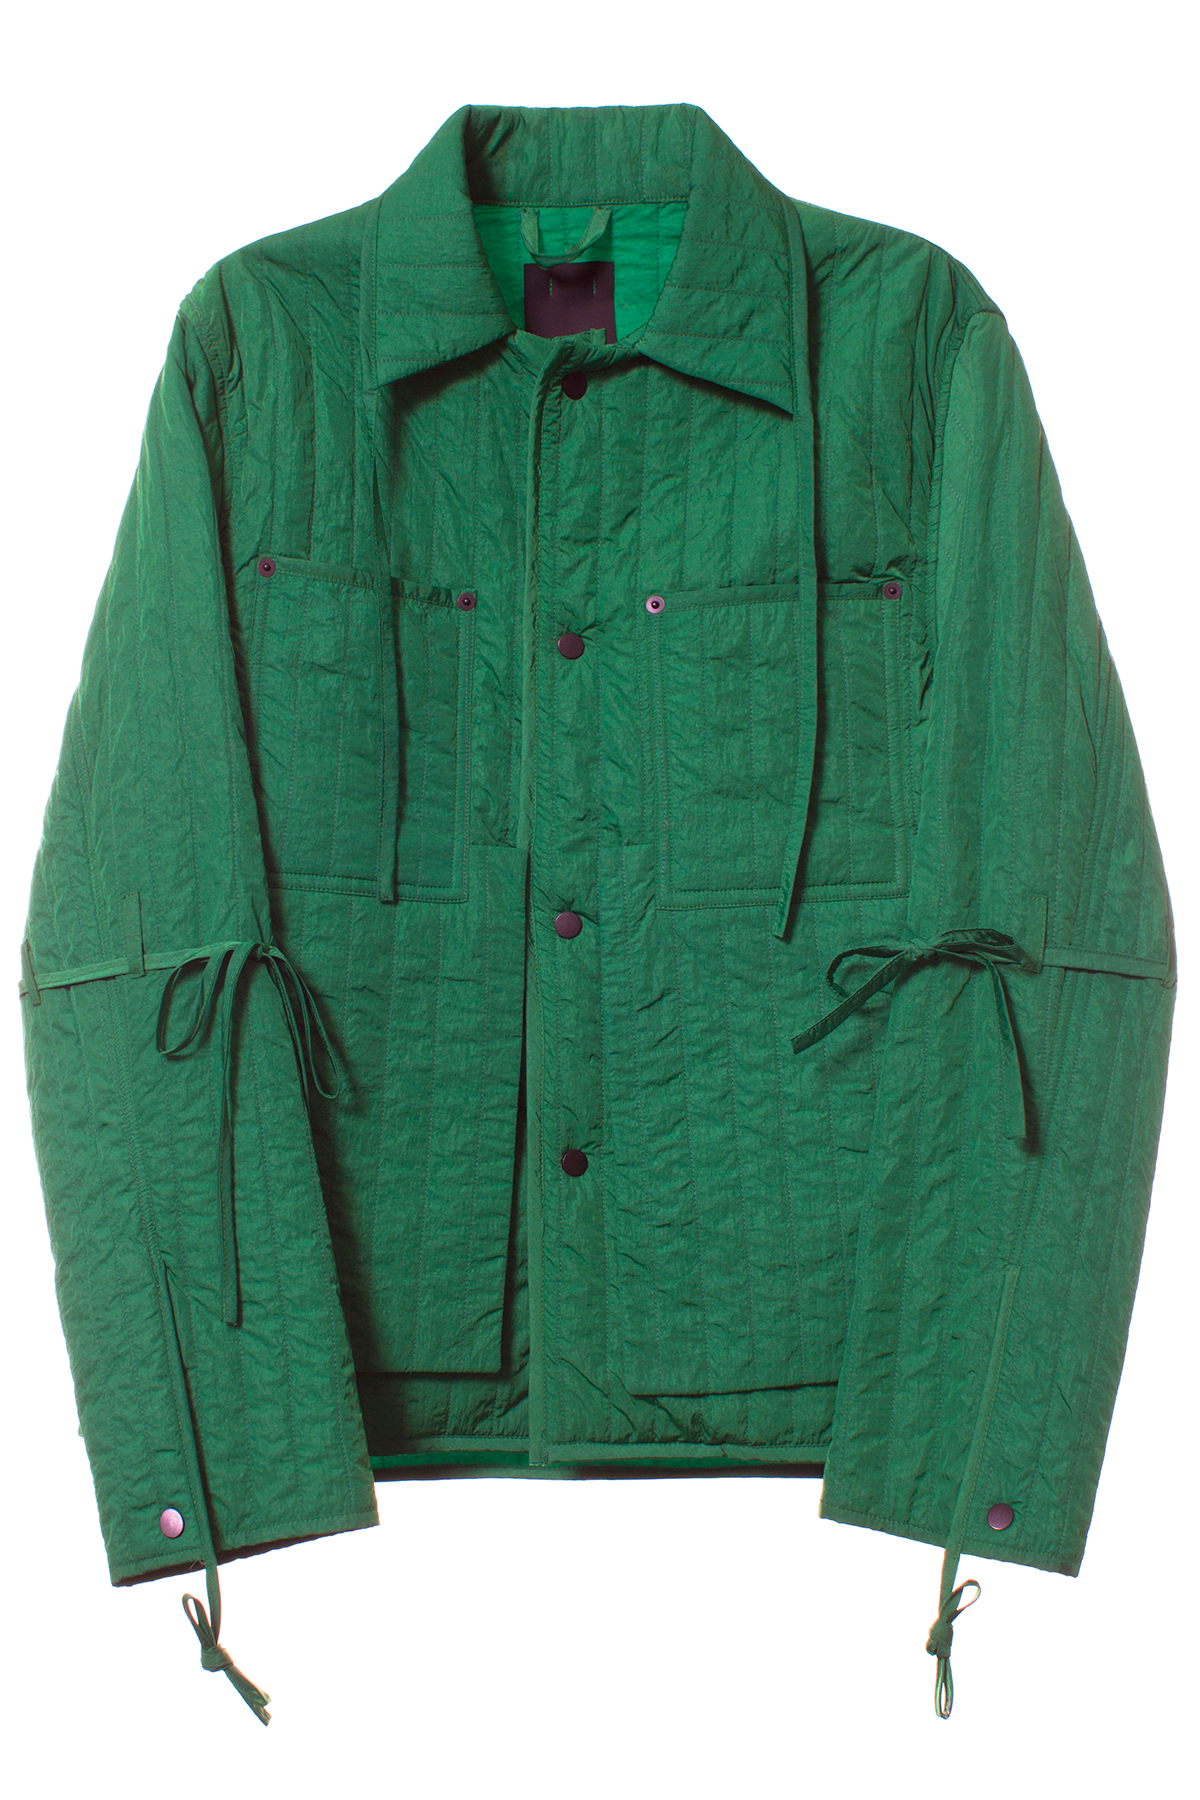 Quilted Workwear Jacket Craiggreen Vfiles Shop Work Wear Jackets East Fashion